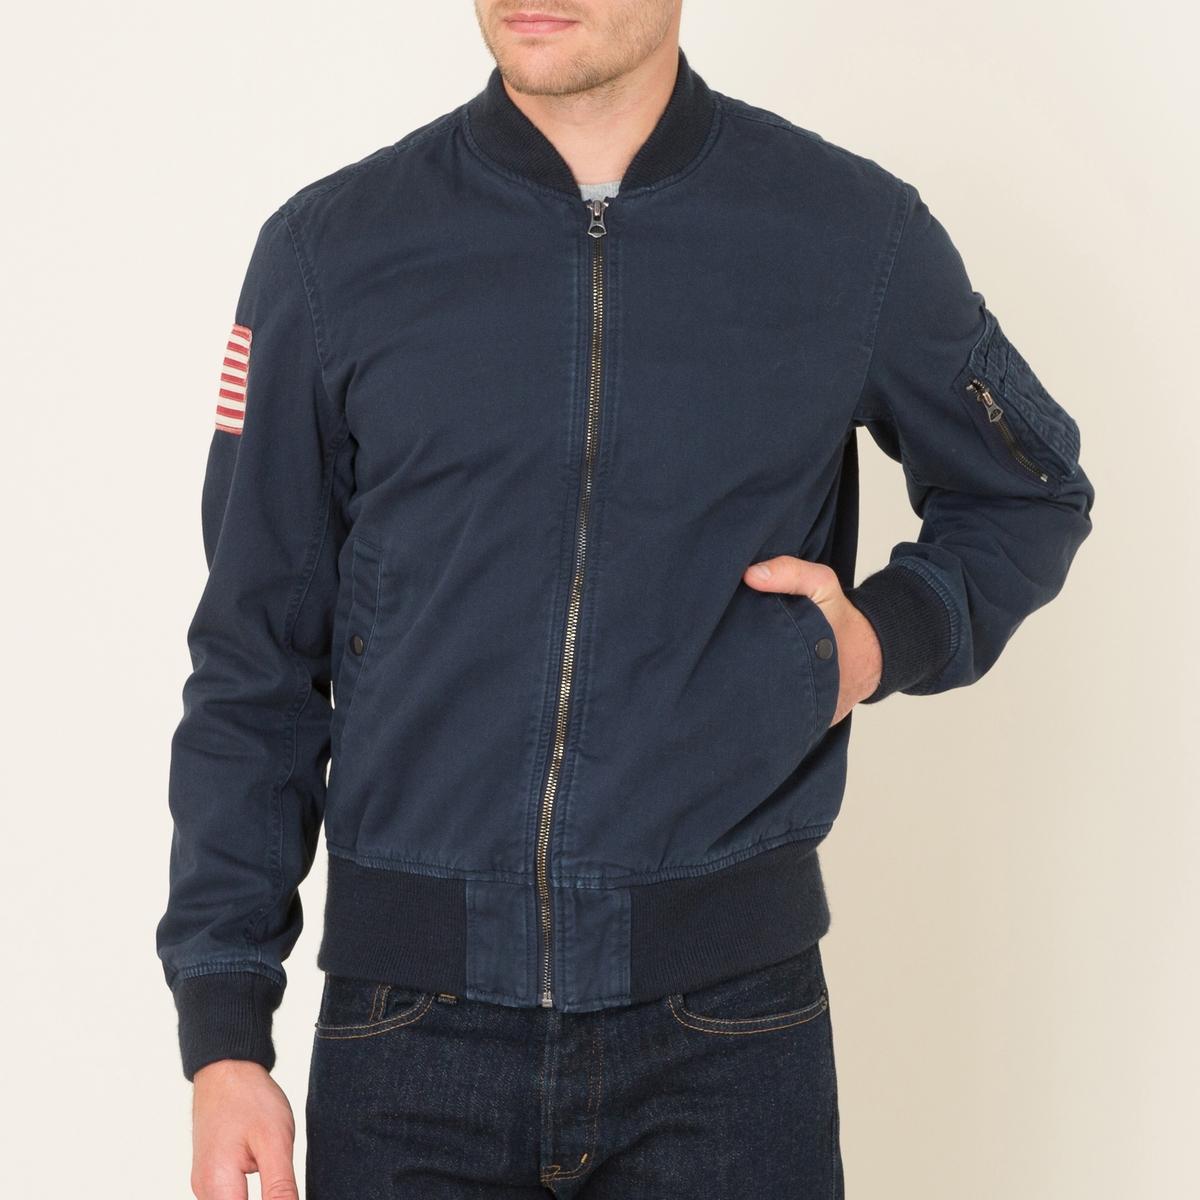 Куртка на молнии ralph lauren топ без рукавов